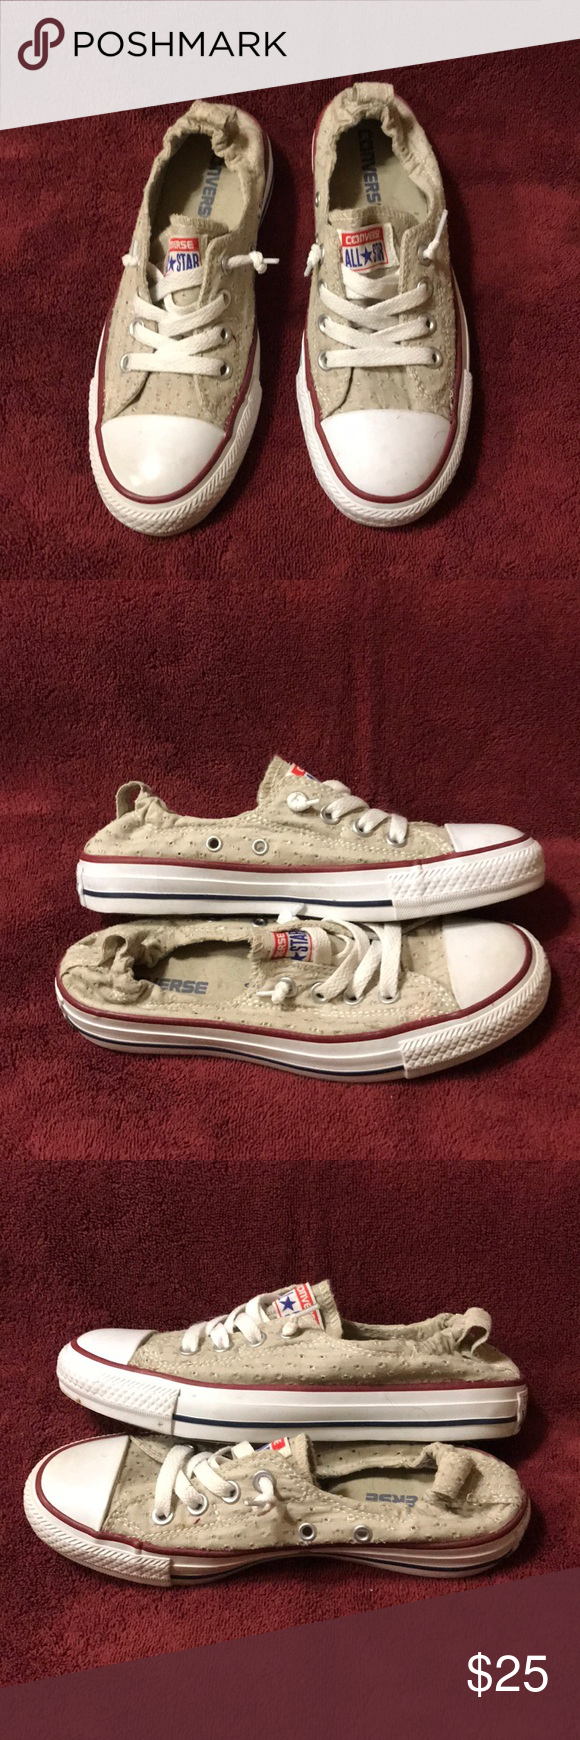 db33ec156c Converse shoreline Converse all store shoreline slip on sneakers Good  condition smoke-free home Converse Shoes Sneakers